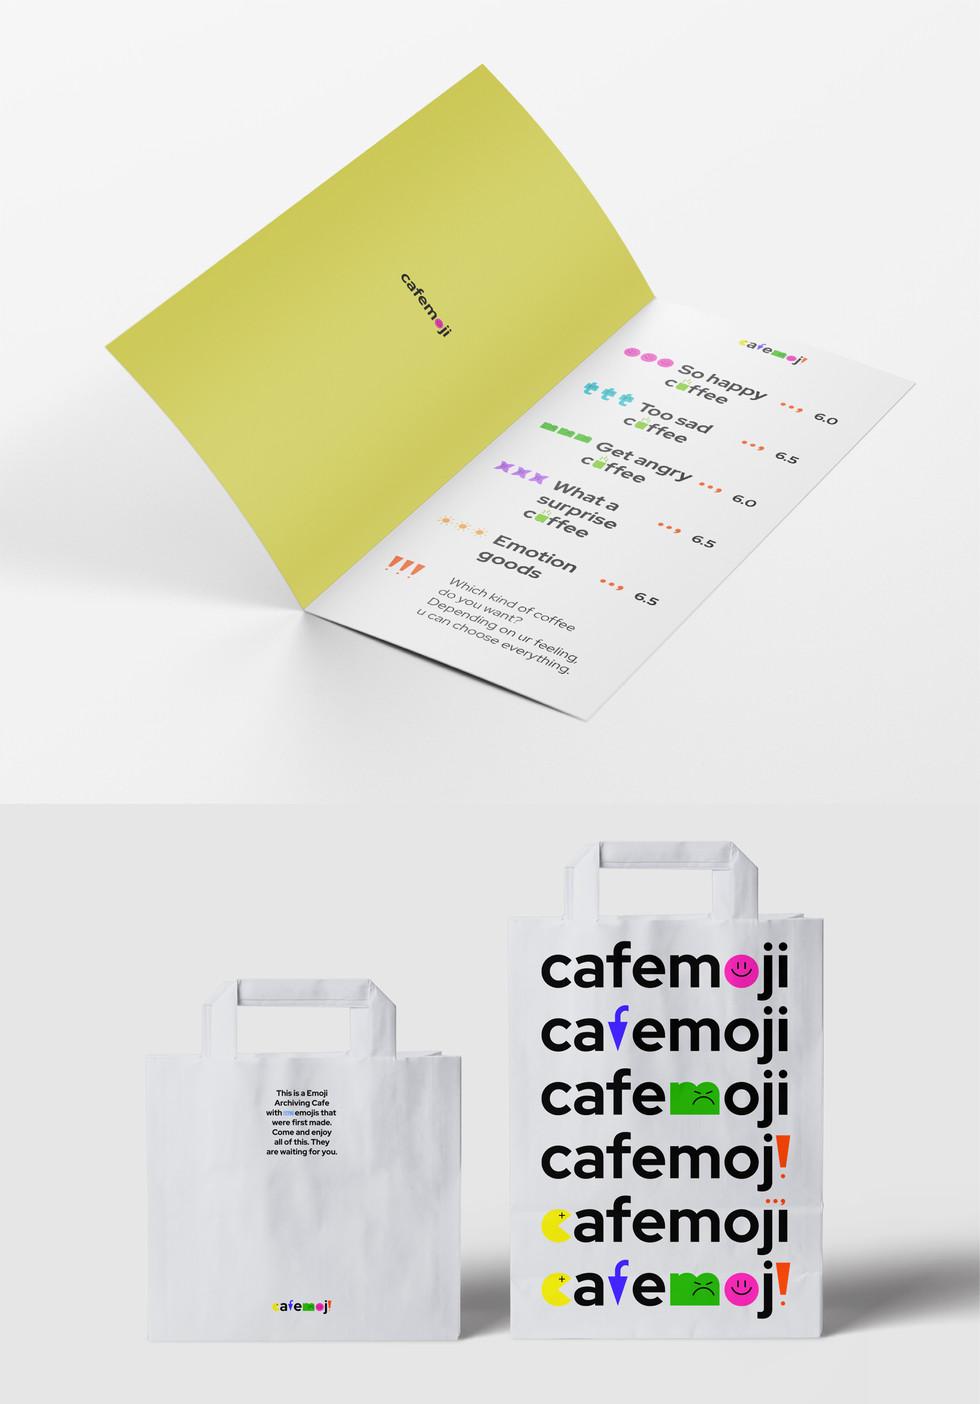 cafemoji, Package Design